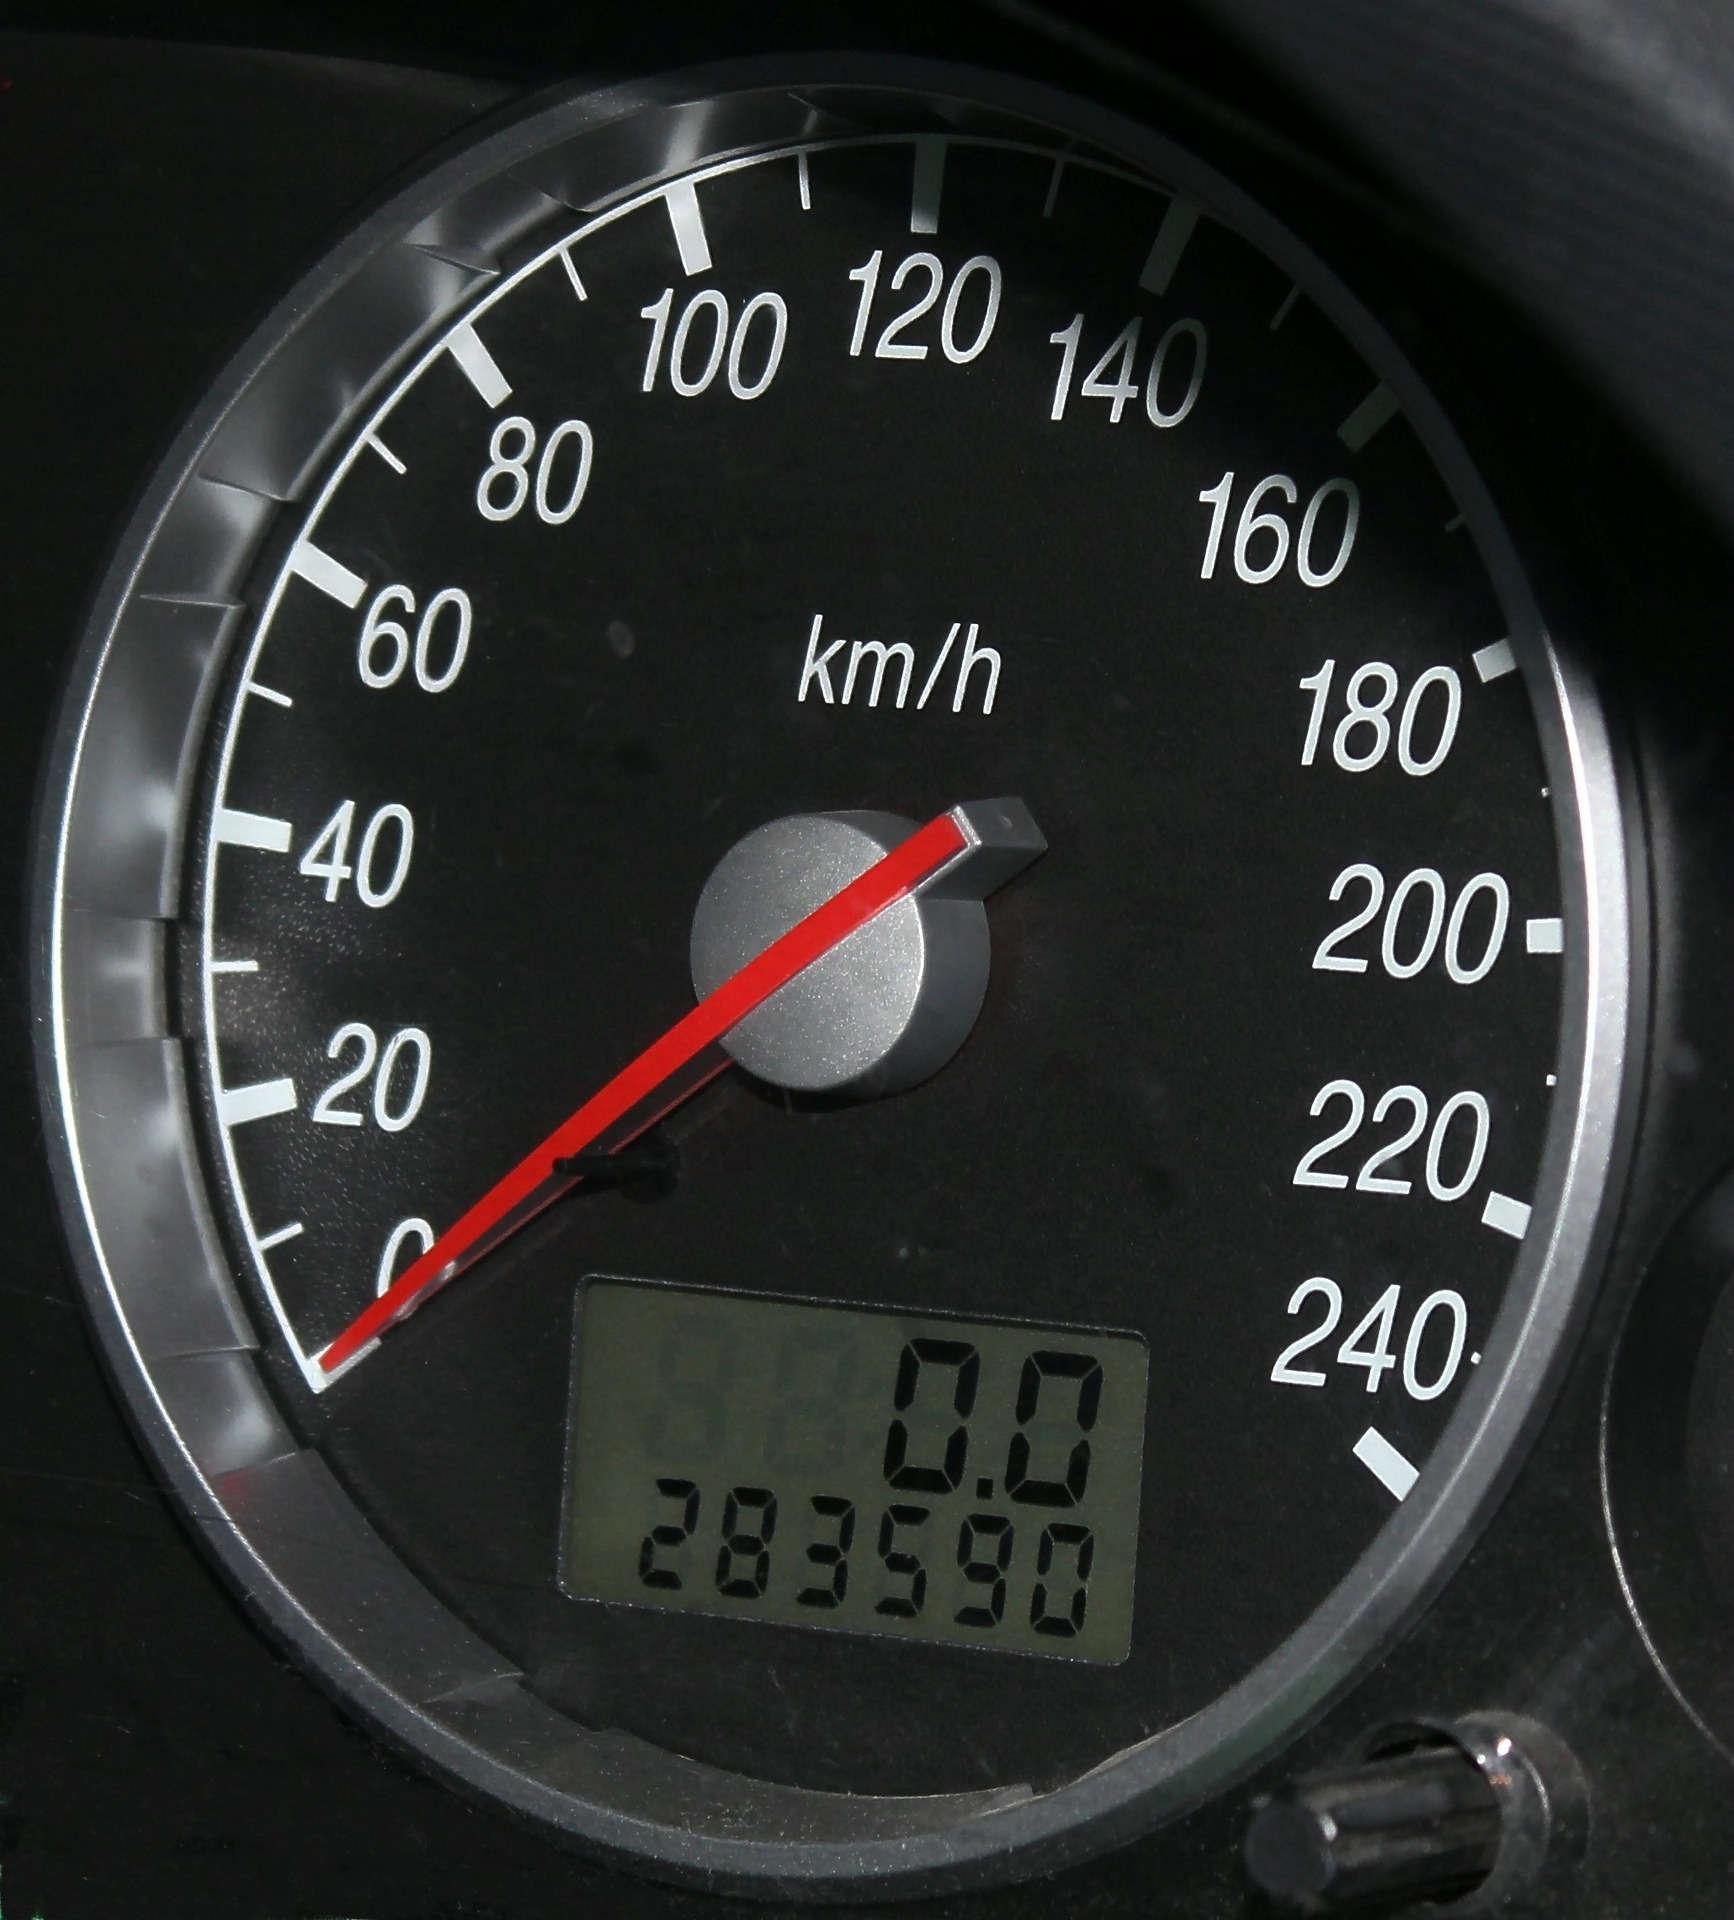 speedo-534761_1920